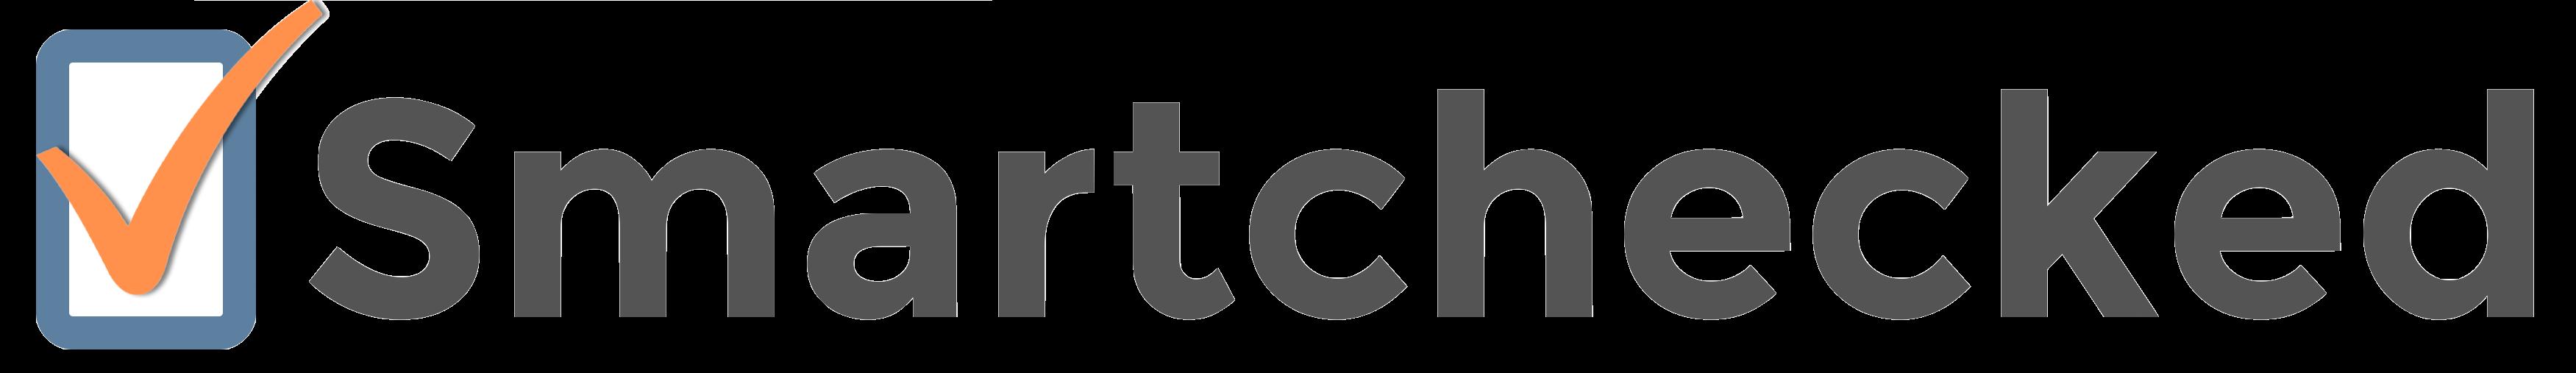 Smartchecked Logo